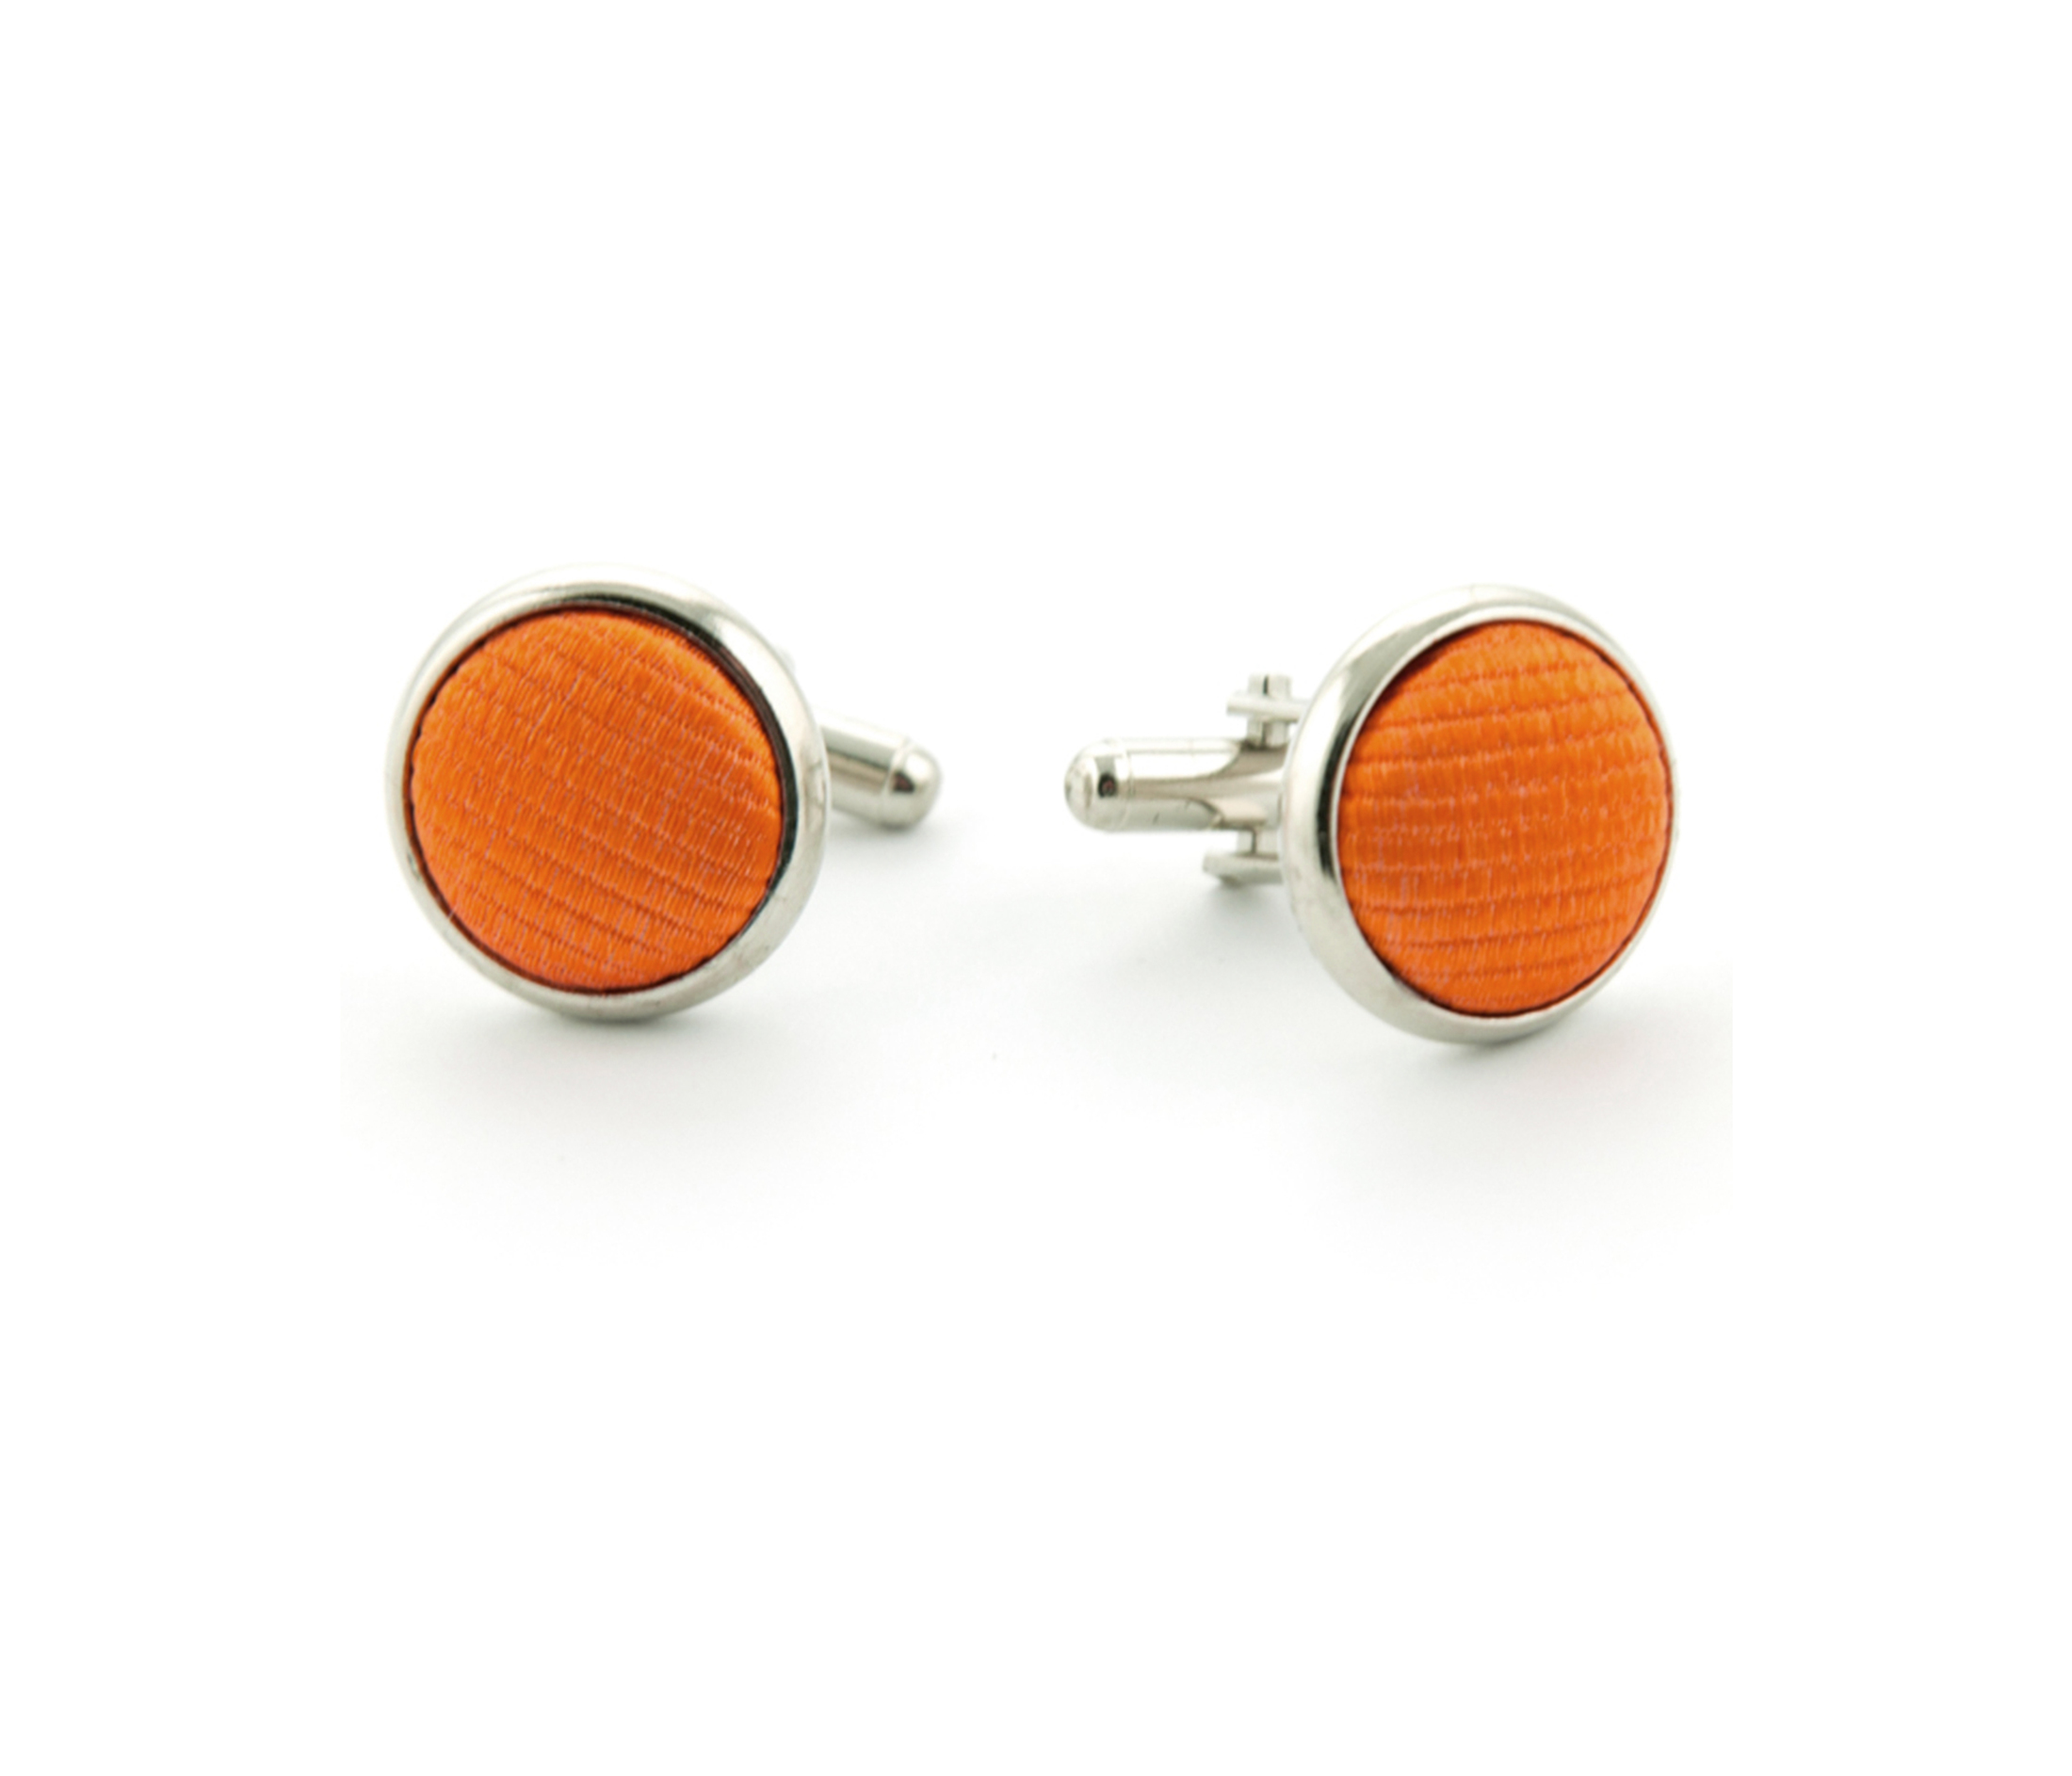 Zijde Manchetknoop Oranje F01 foto 0